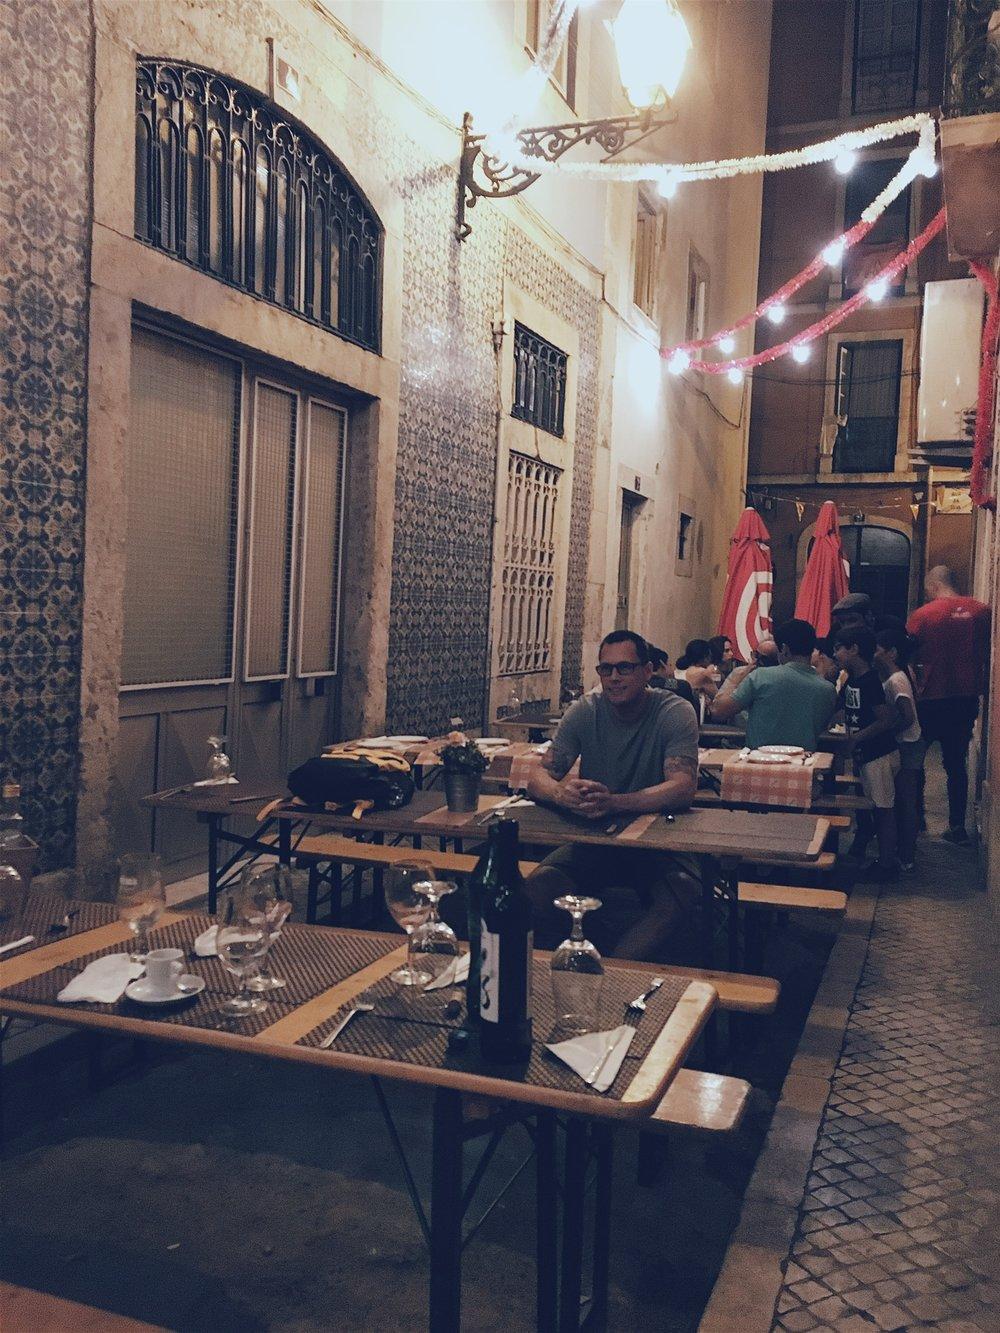 ...Like this quaint outdoor restaurant